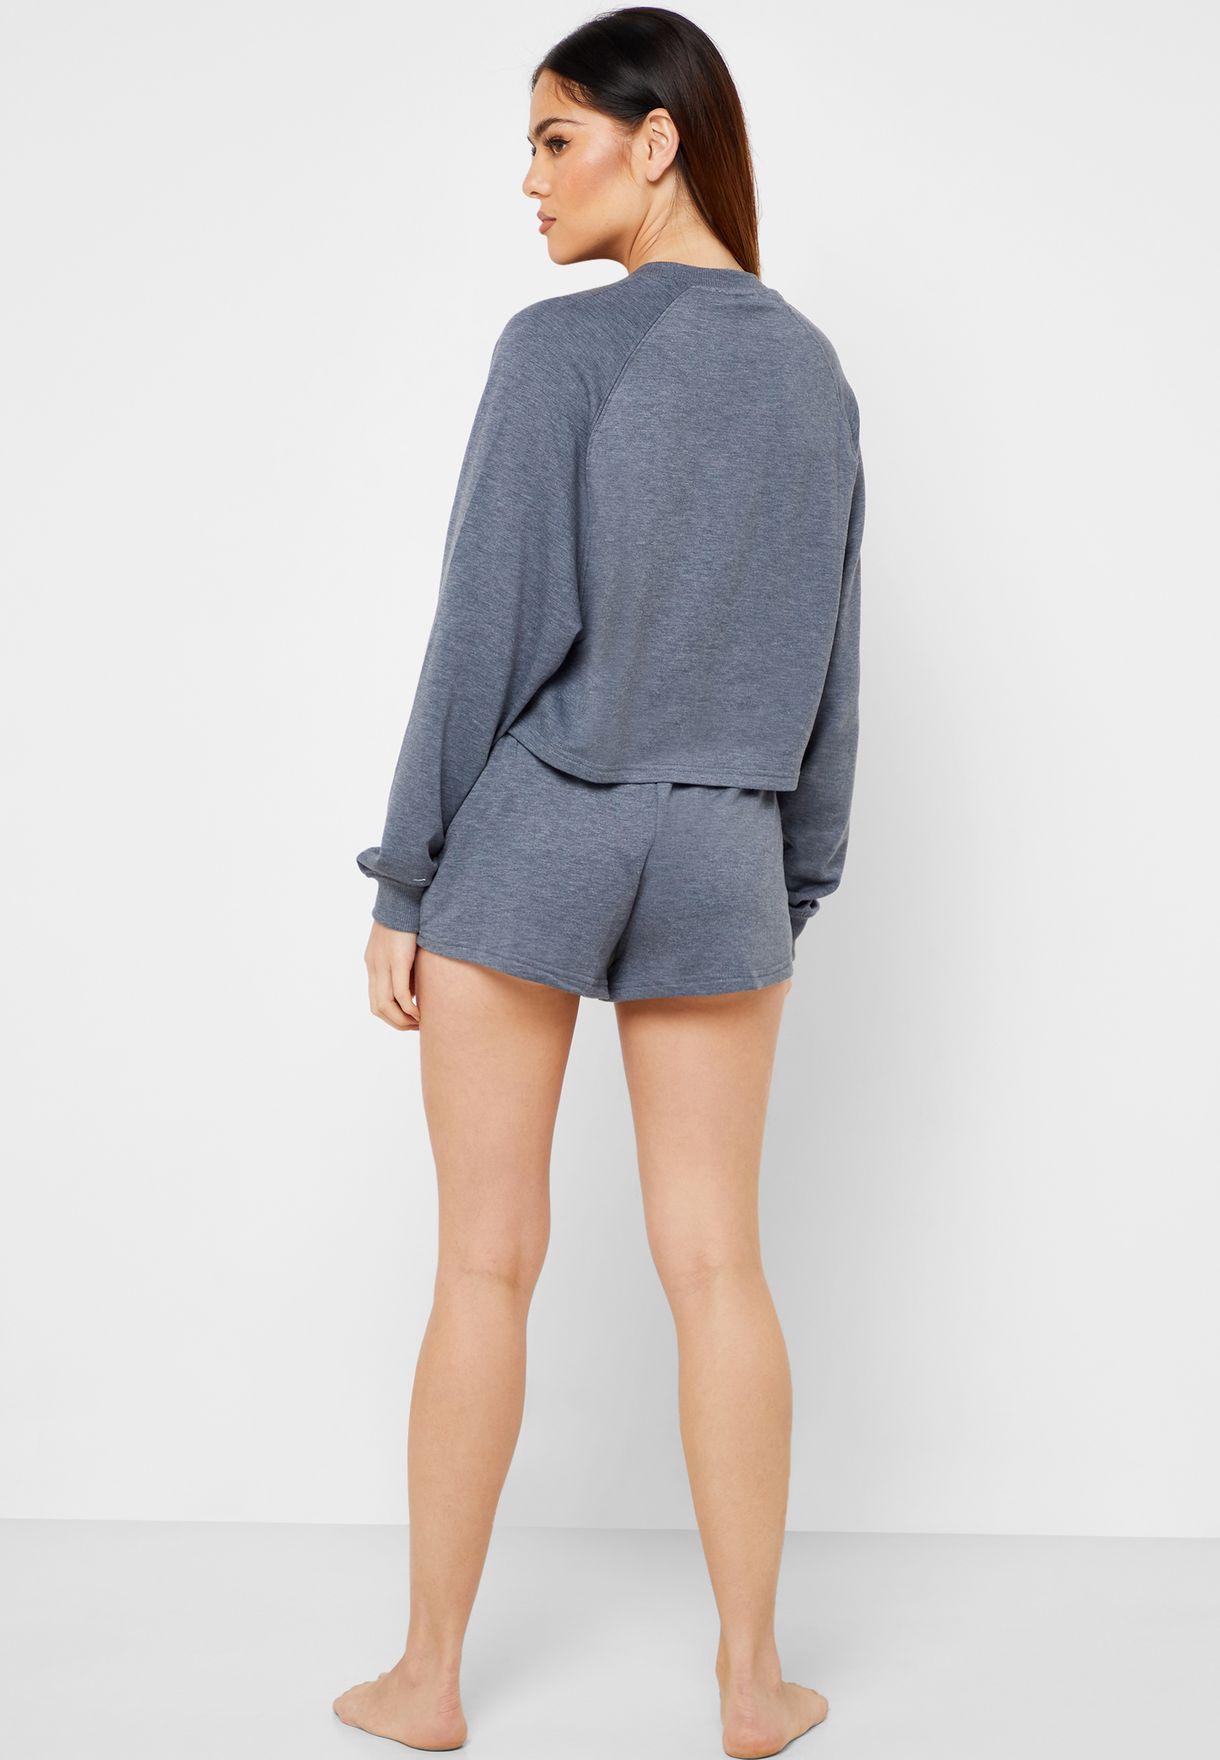 Slogan Sweatshirt & Shorts Set